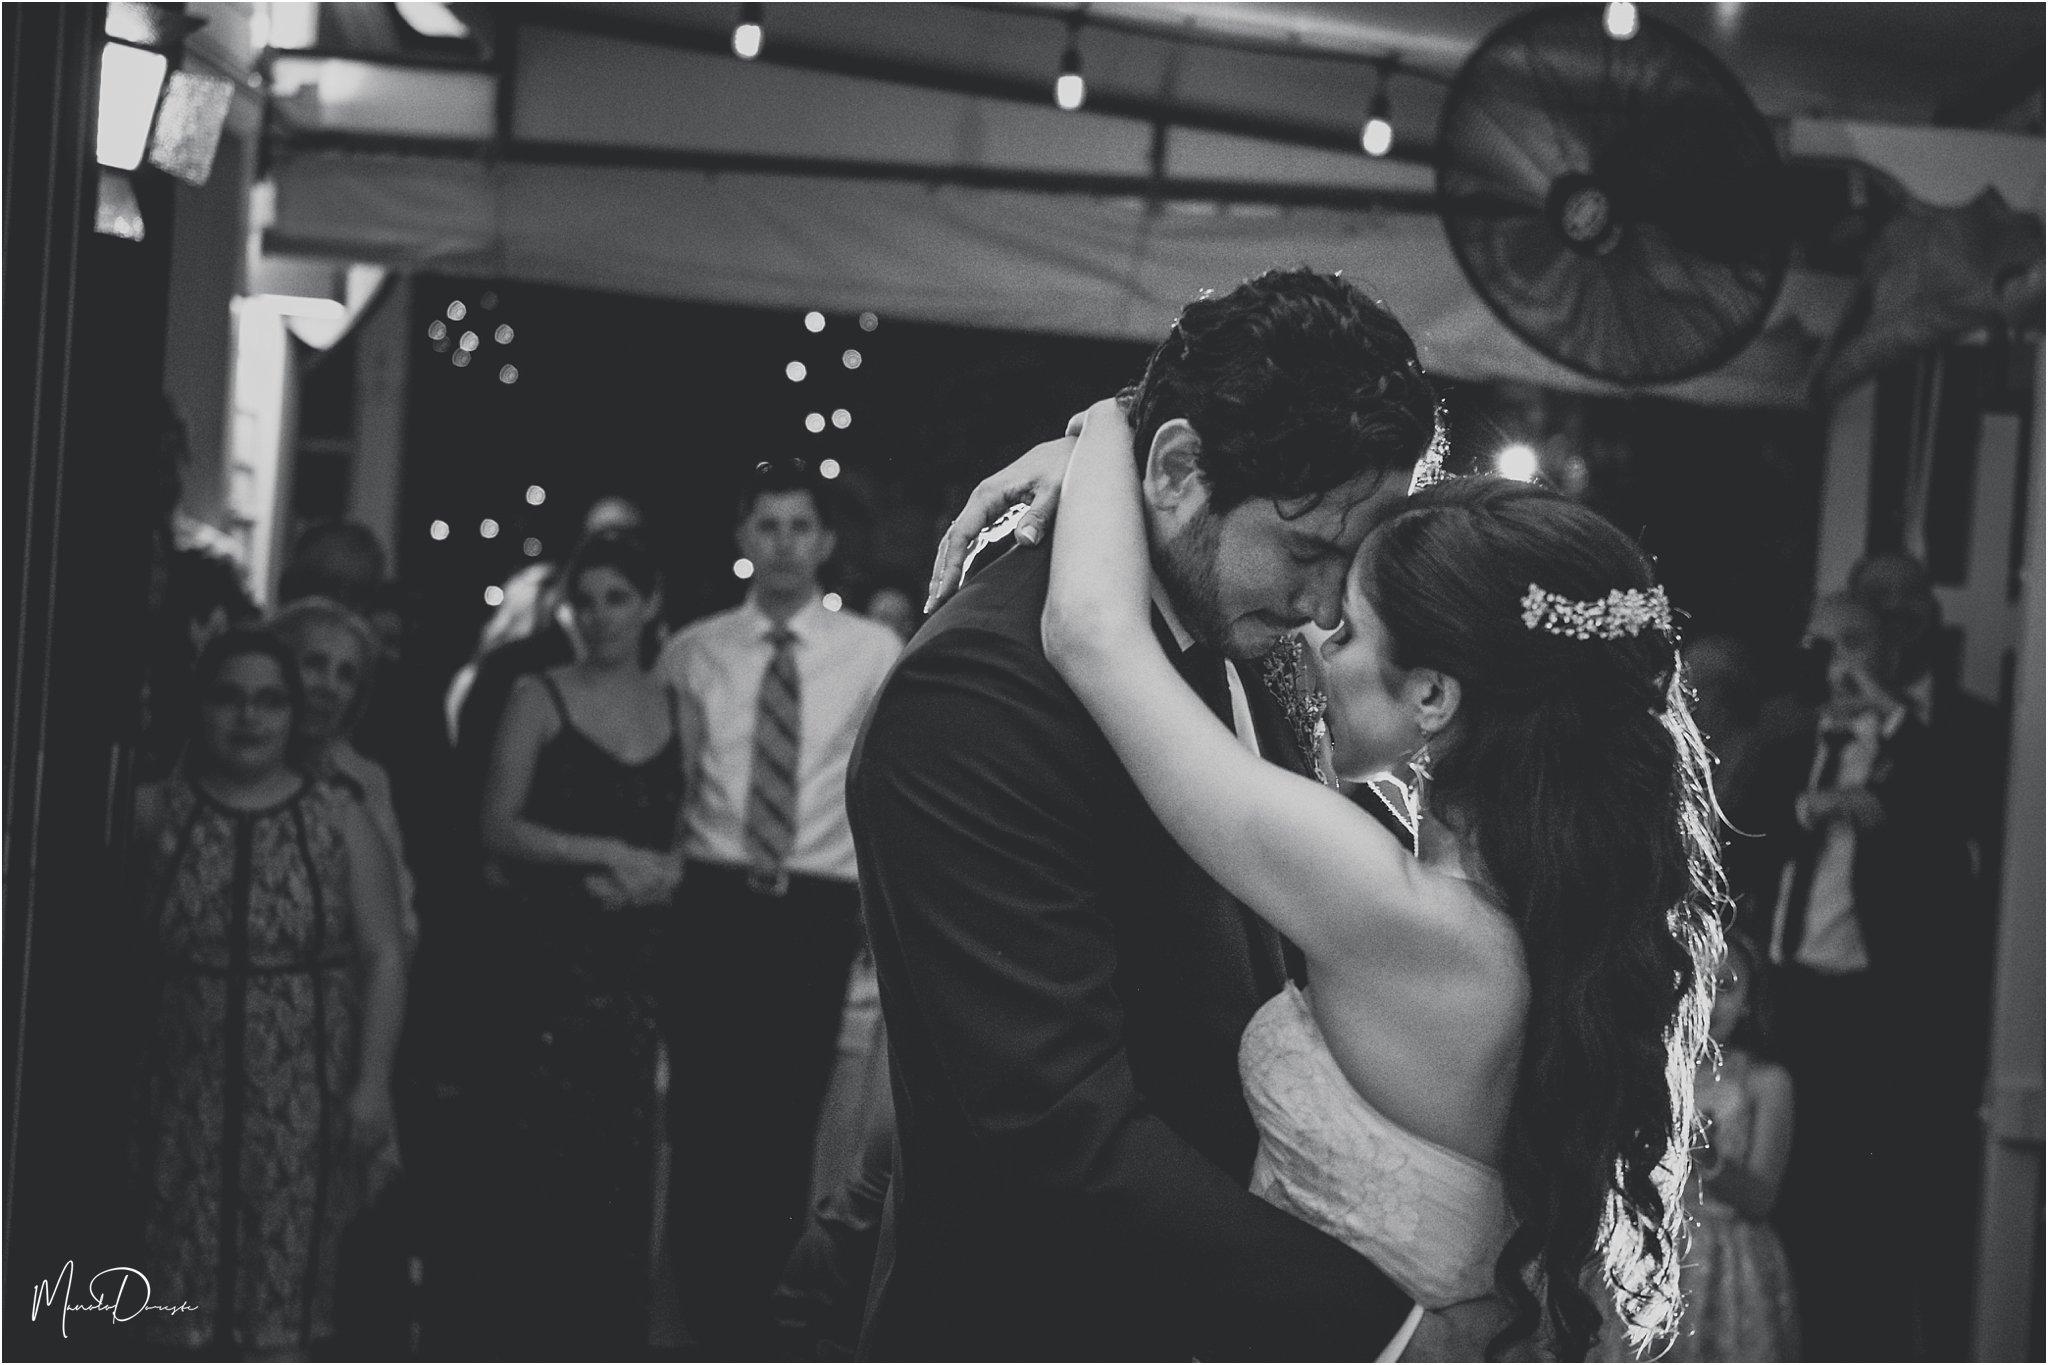 0522_ManoloDoreste_InFocusStudios_Wedding_Family_Photography_Miami_MiamiPhotographer.jpg